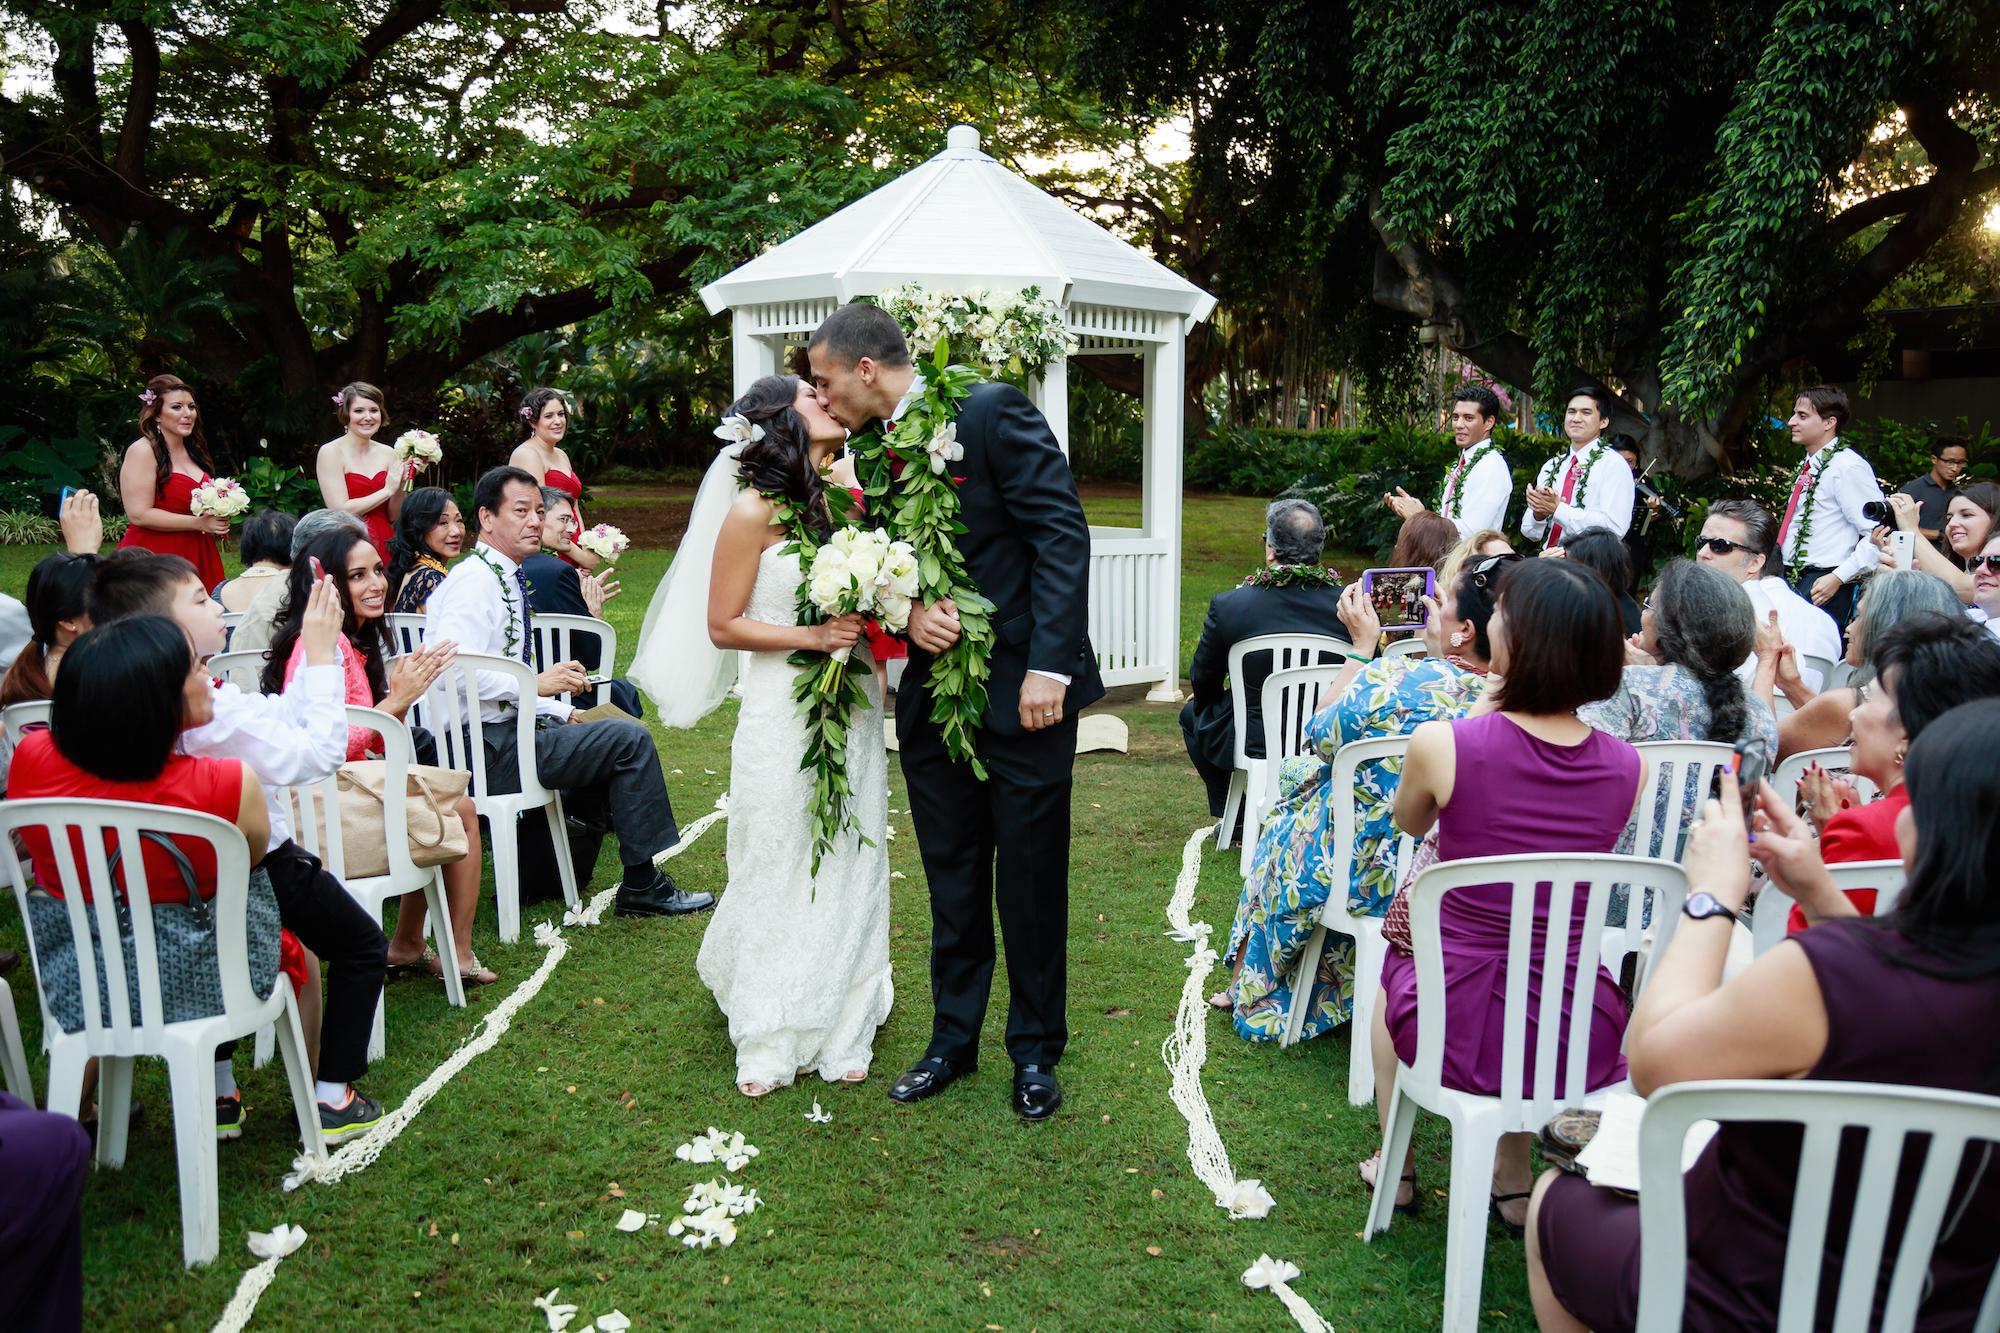 The Manfre Wedding At Hale Koa Mayberry Multimedia